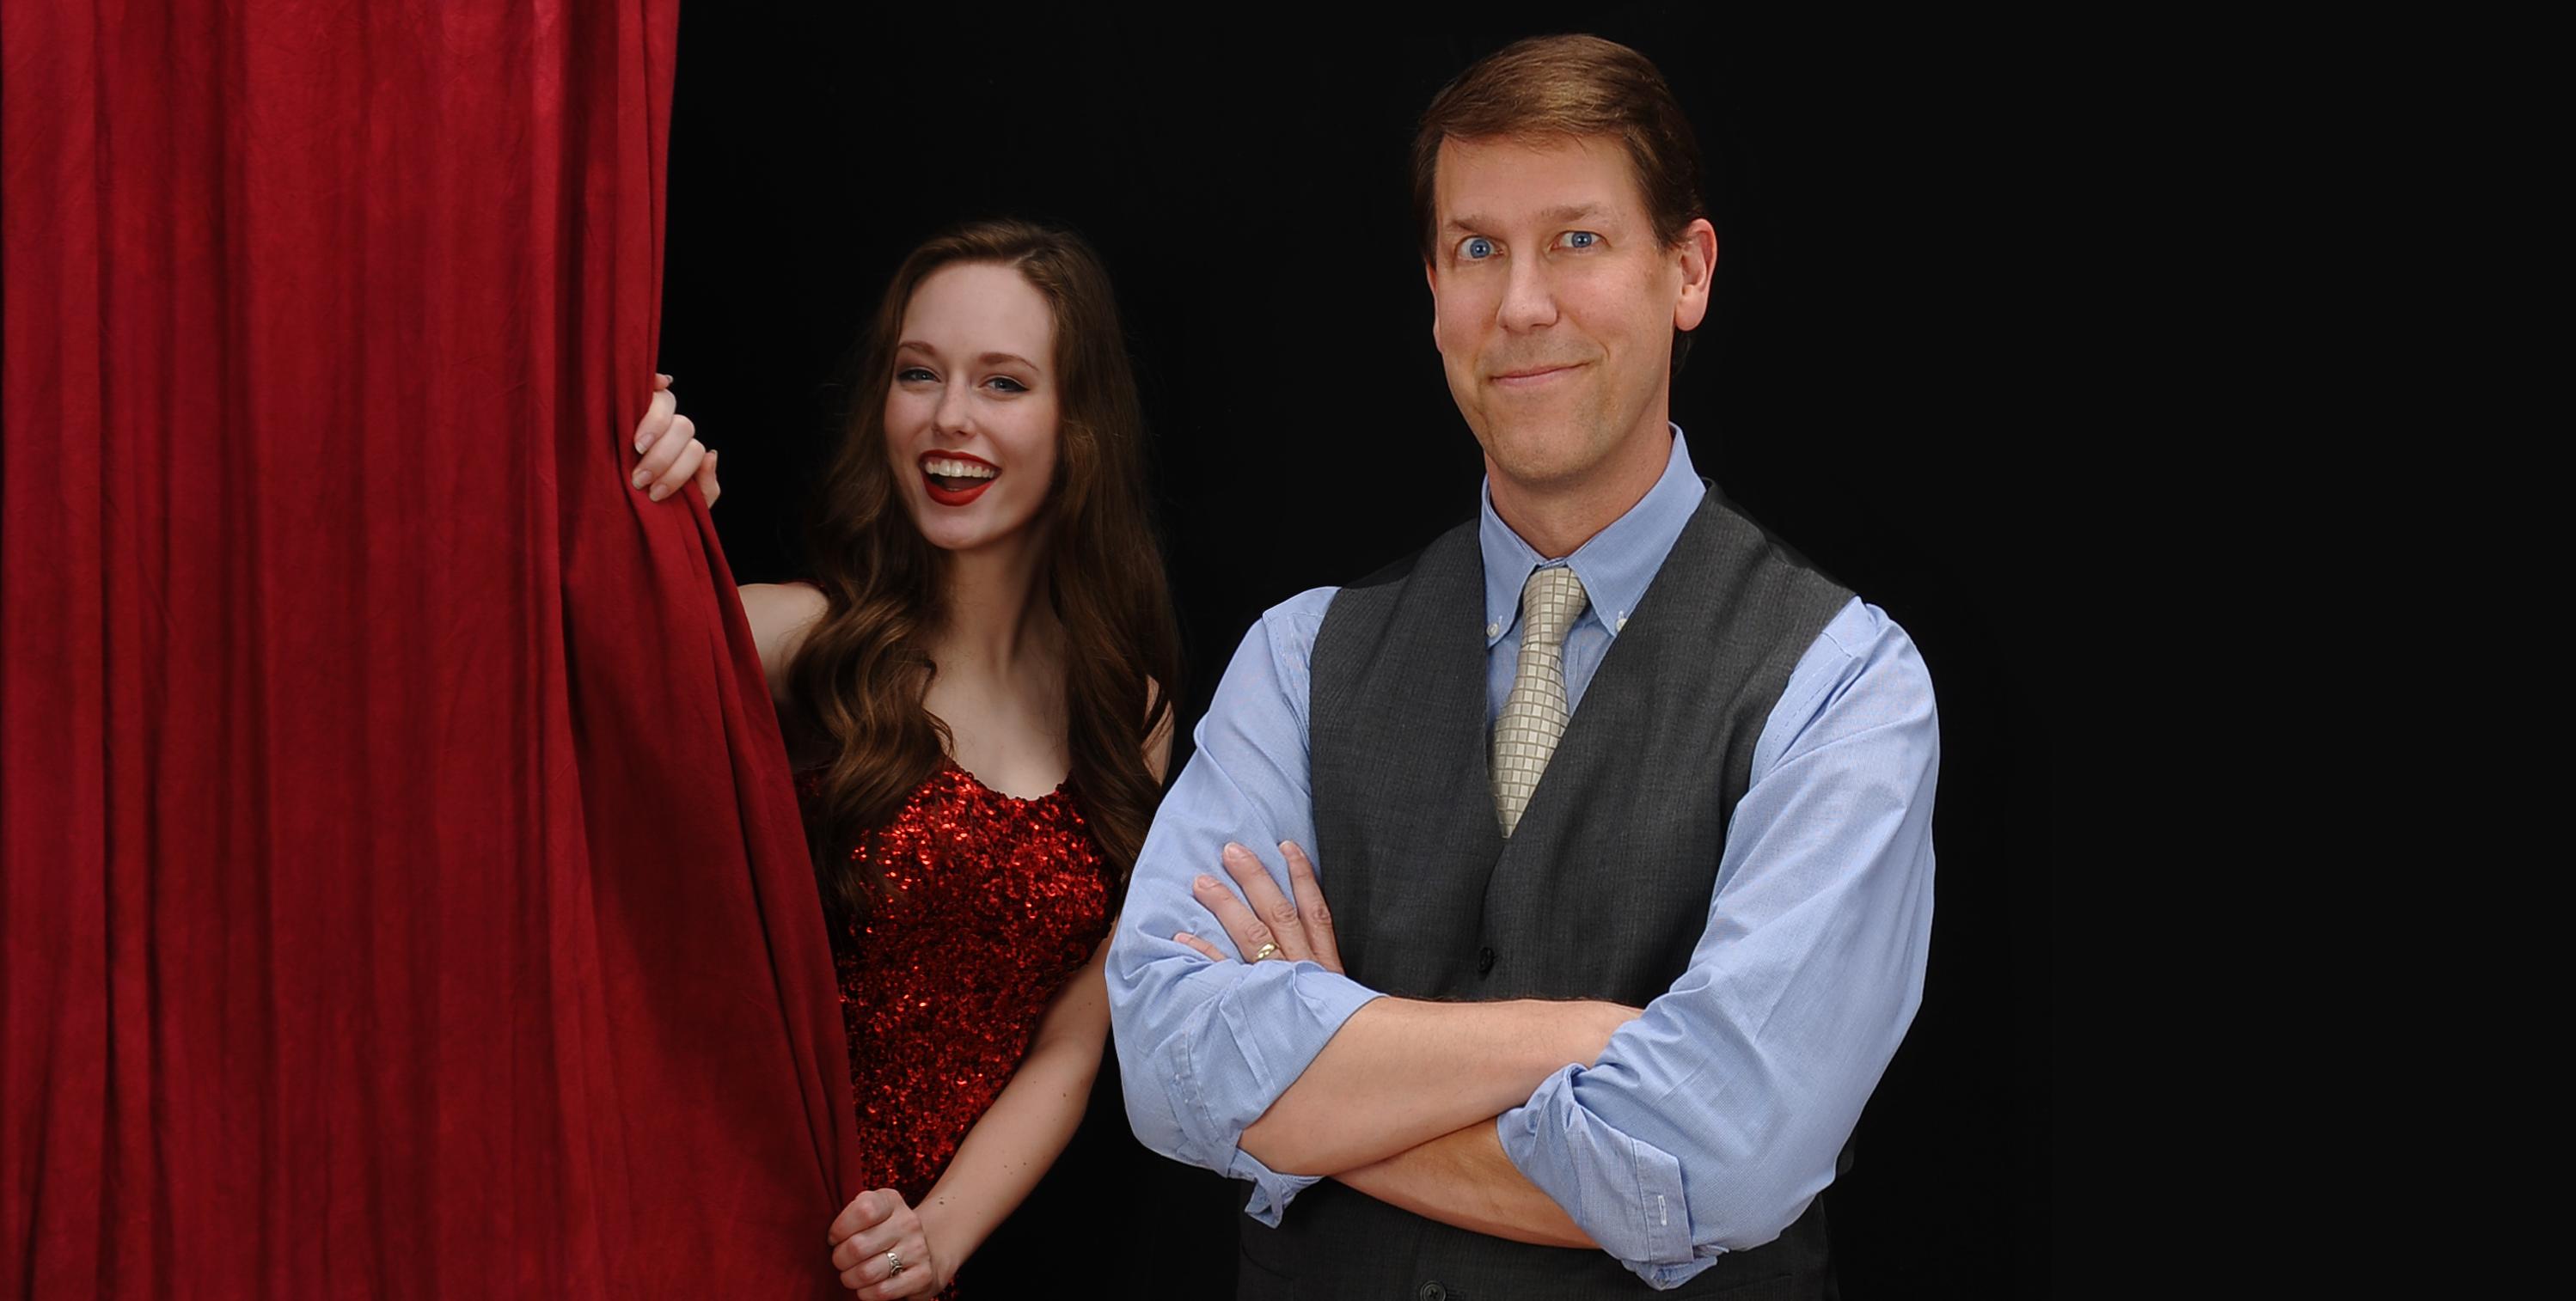 Motivational Comedian Magician... Mark Robinson - Motivational Speaker - Anita, IA